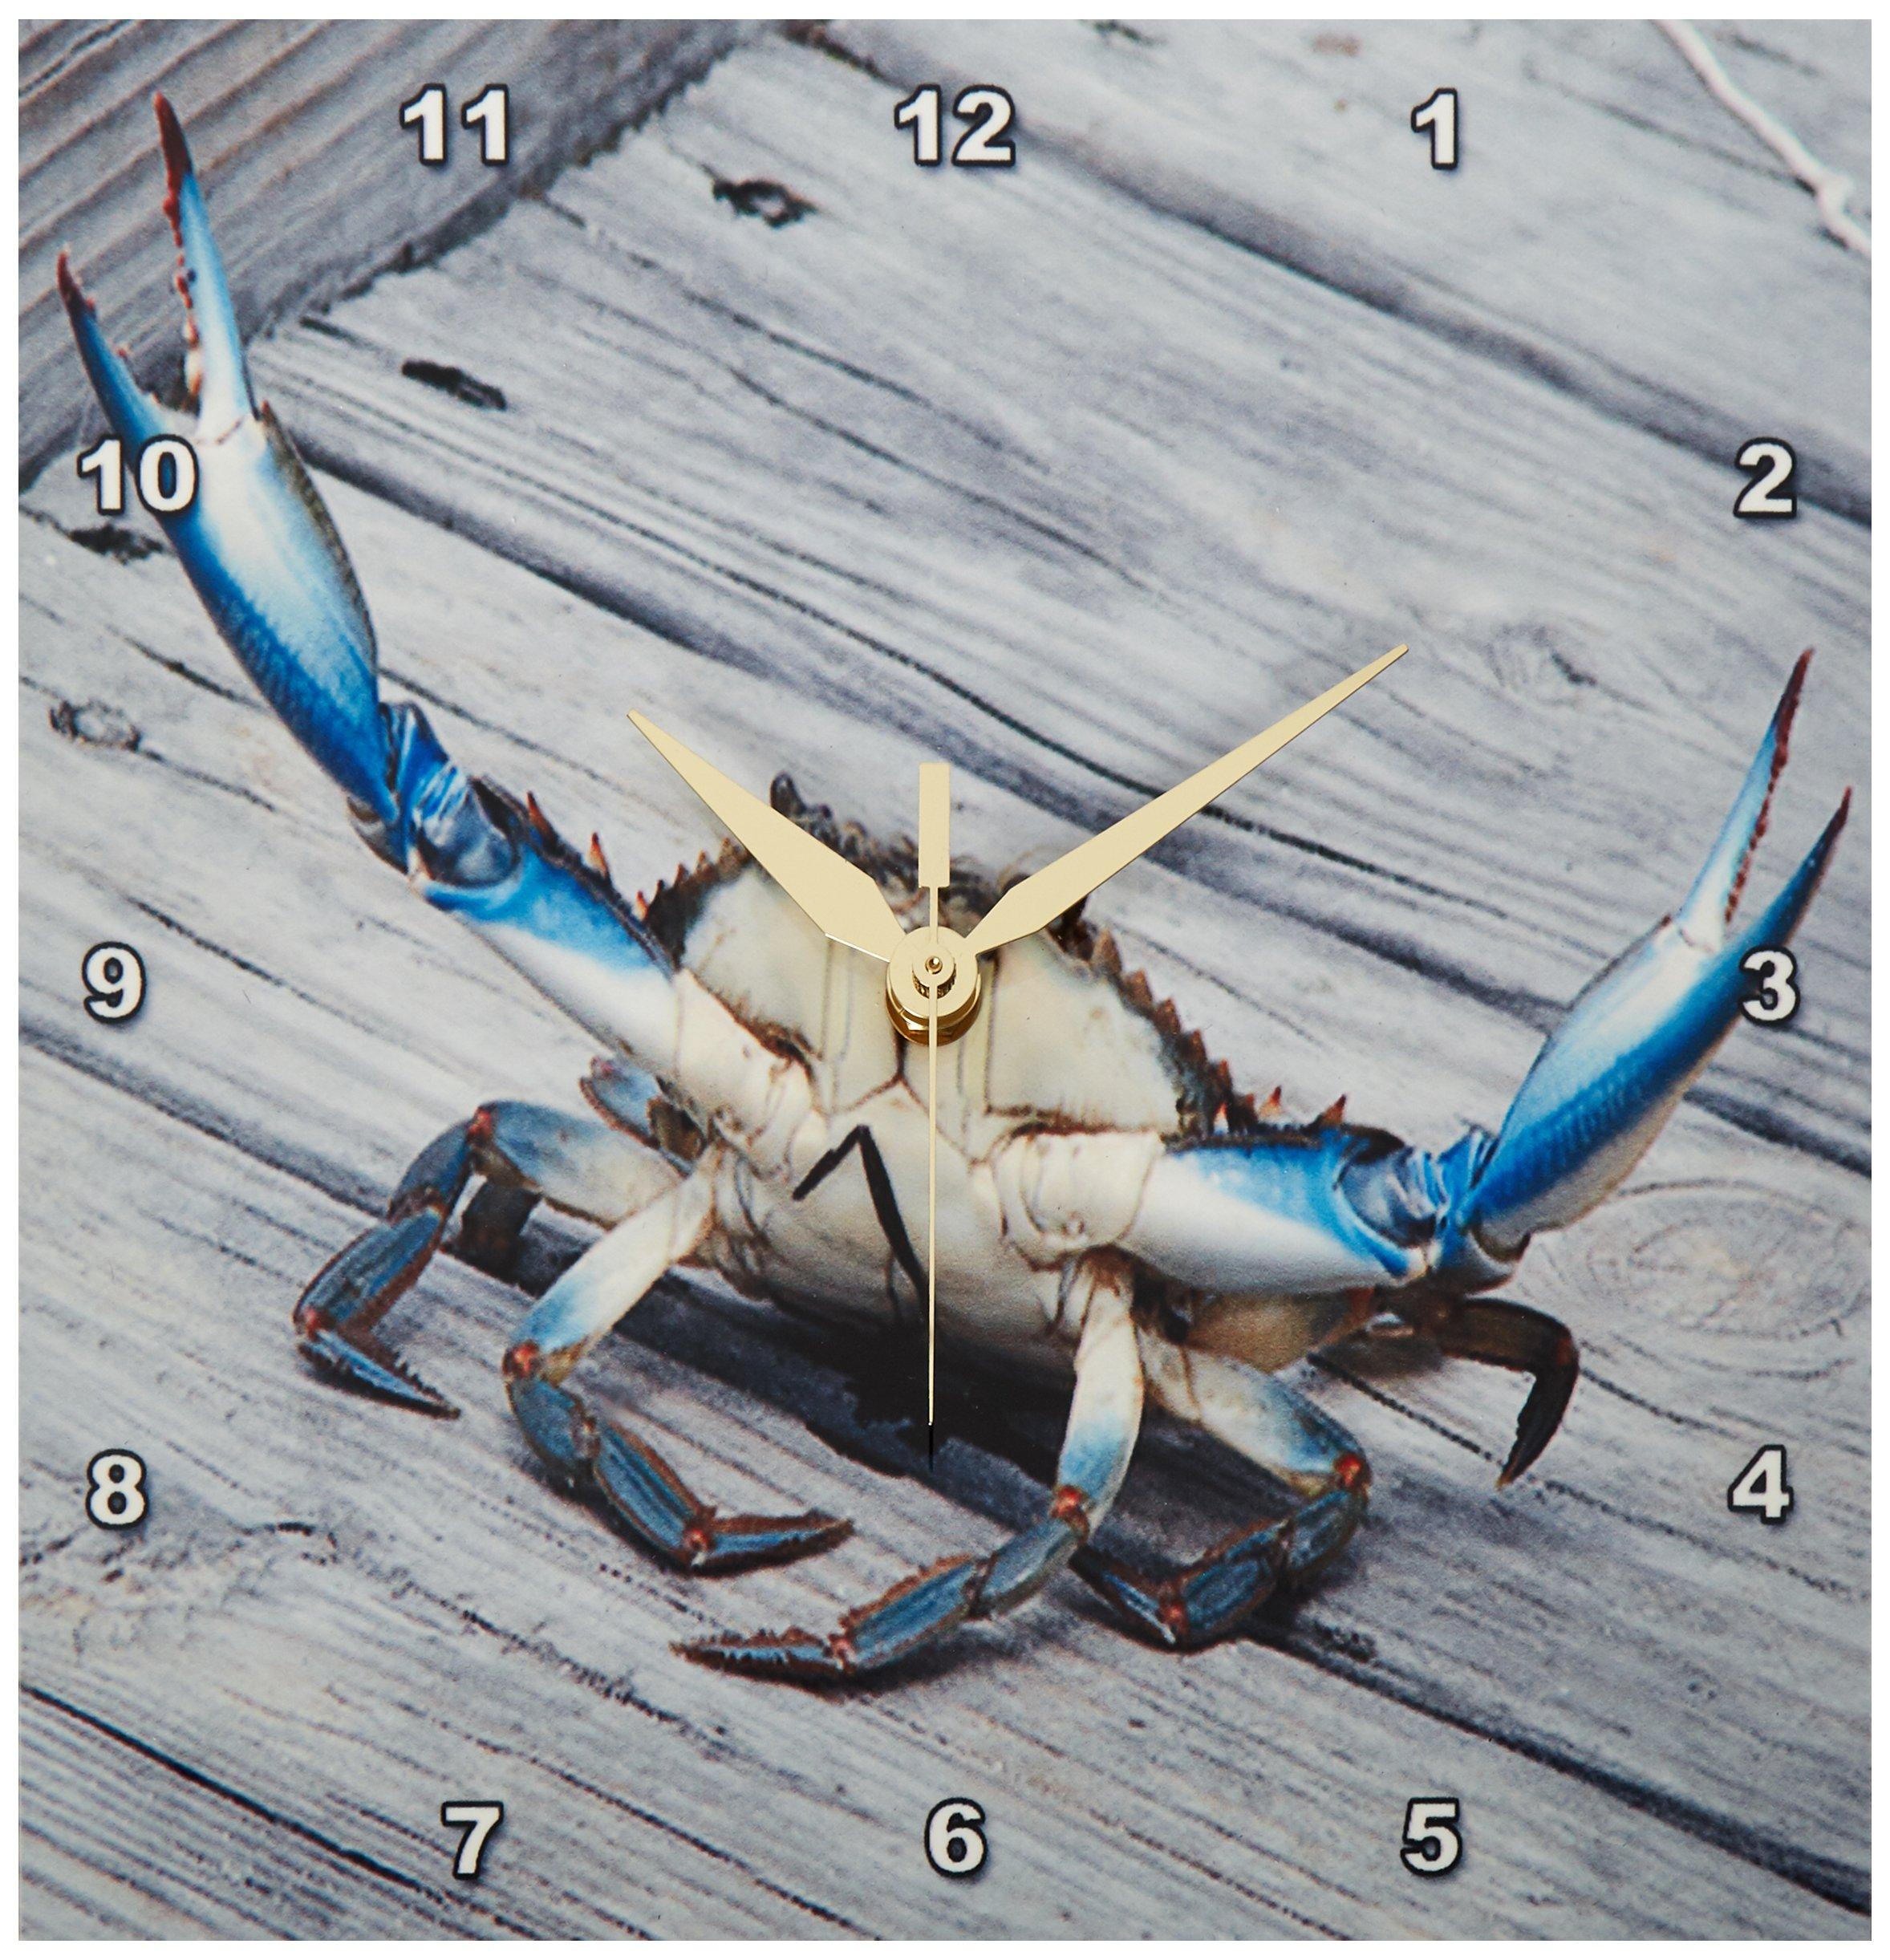 3dRose dpp_63150_1 Blue Crab Marine, Creature, Animal, Animals, Wildlife, Ocean, invertebrate, Blue, Crab, Seafood Wall Clock, 10 by 10-Inch